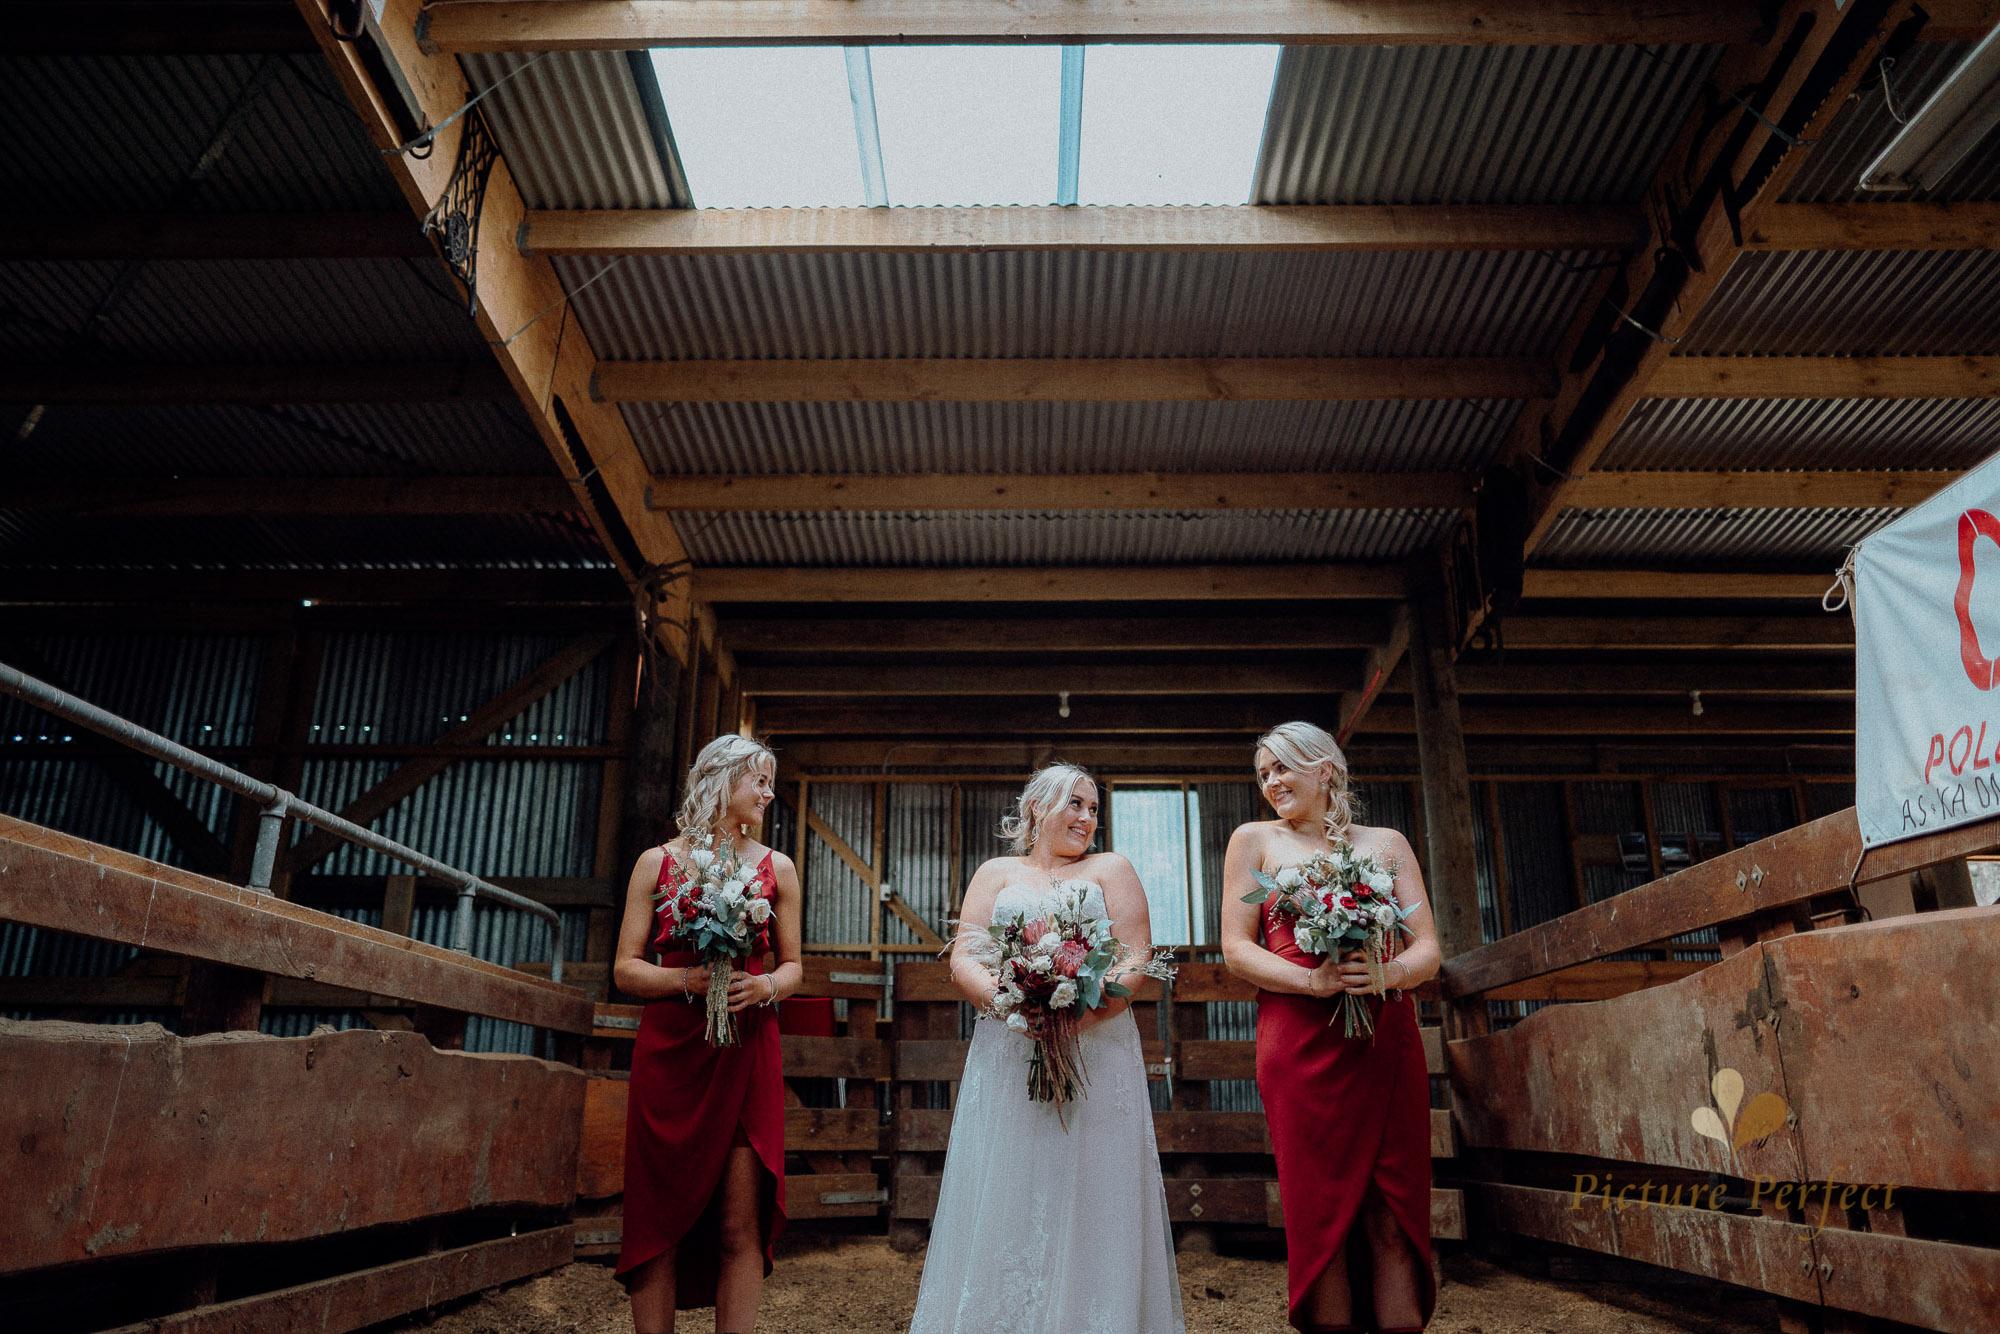 Palmerston North wedding photographer with Monique 0185